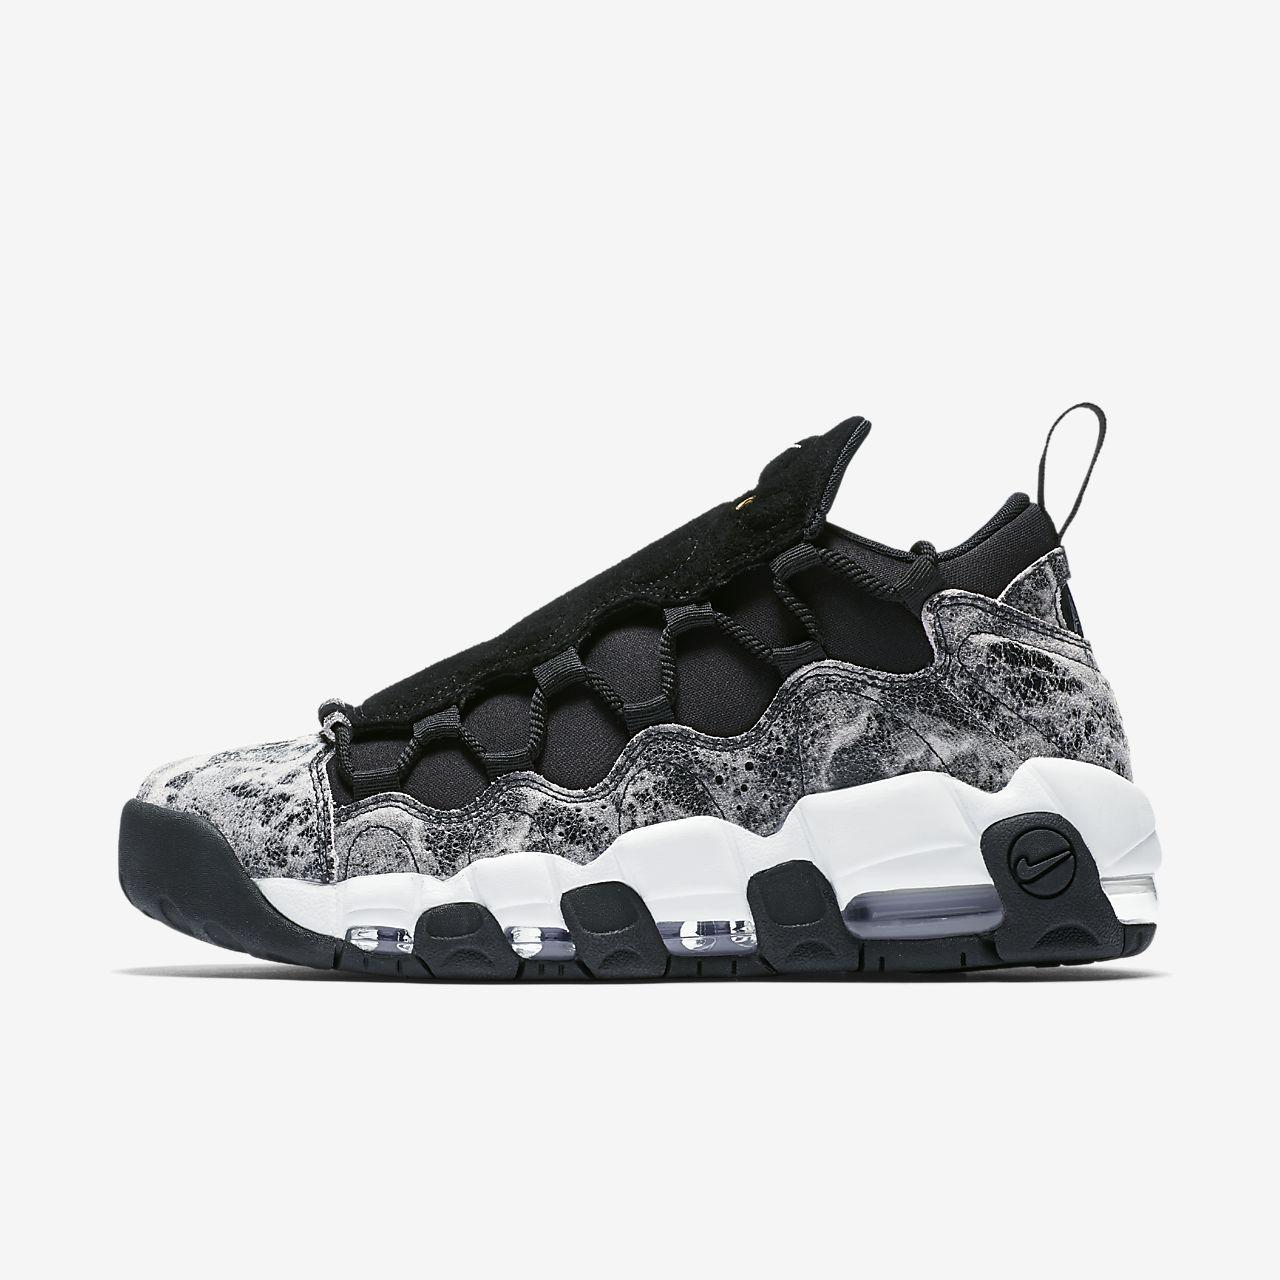 12bafa2aec880b Nike Air More Money LX Women s Shoe. Nike.com NO